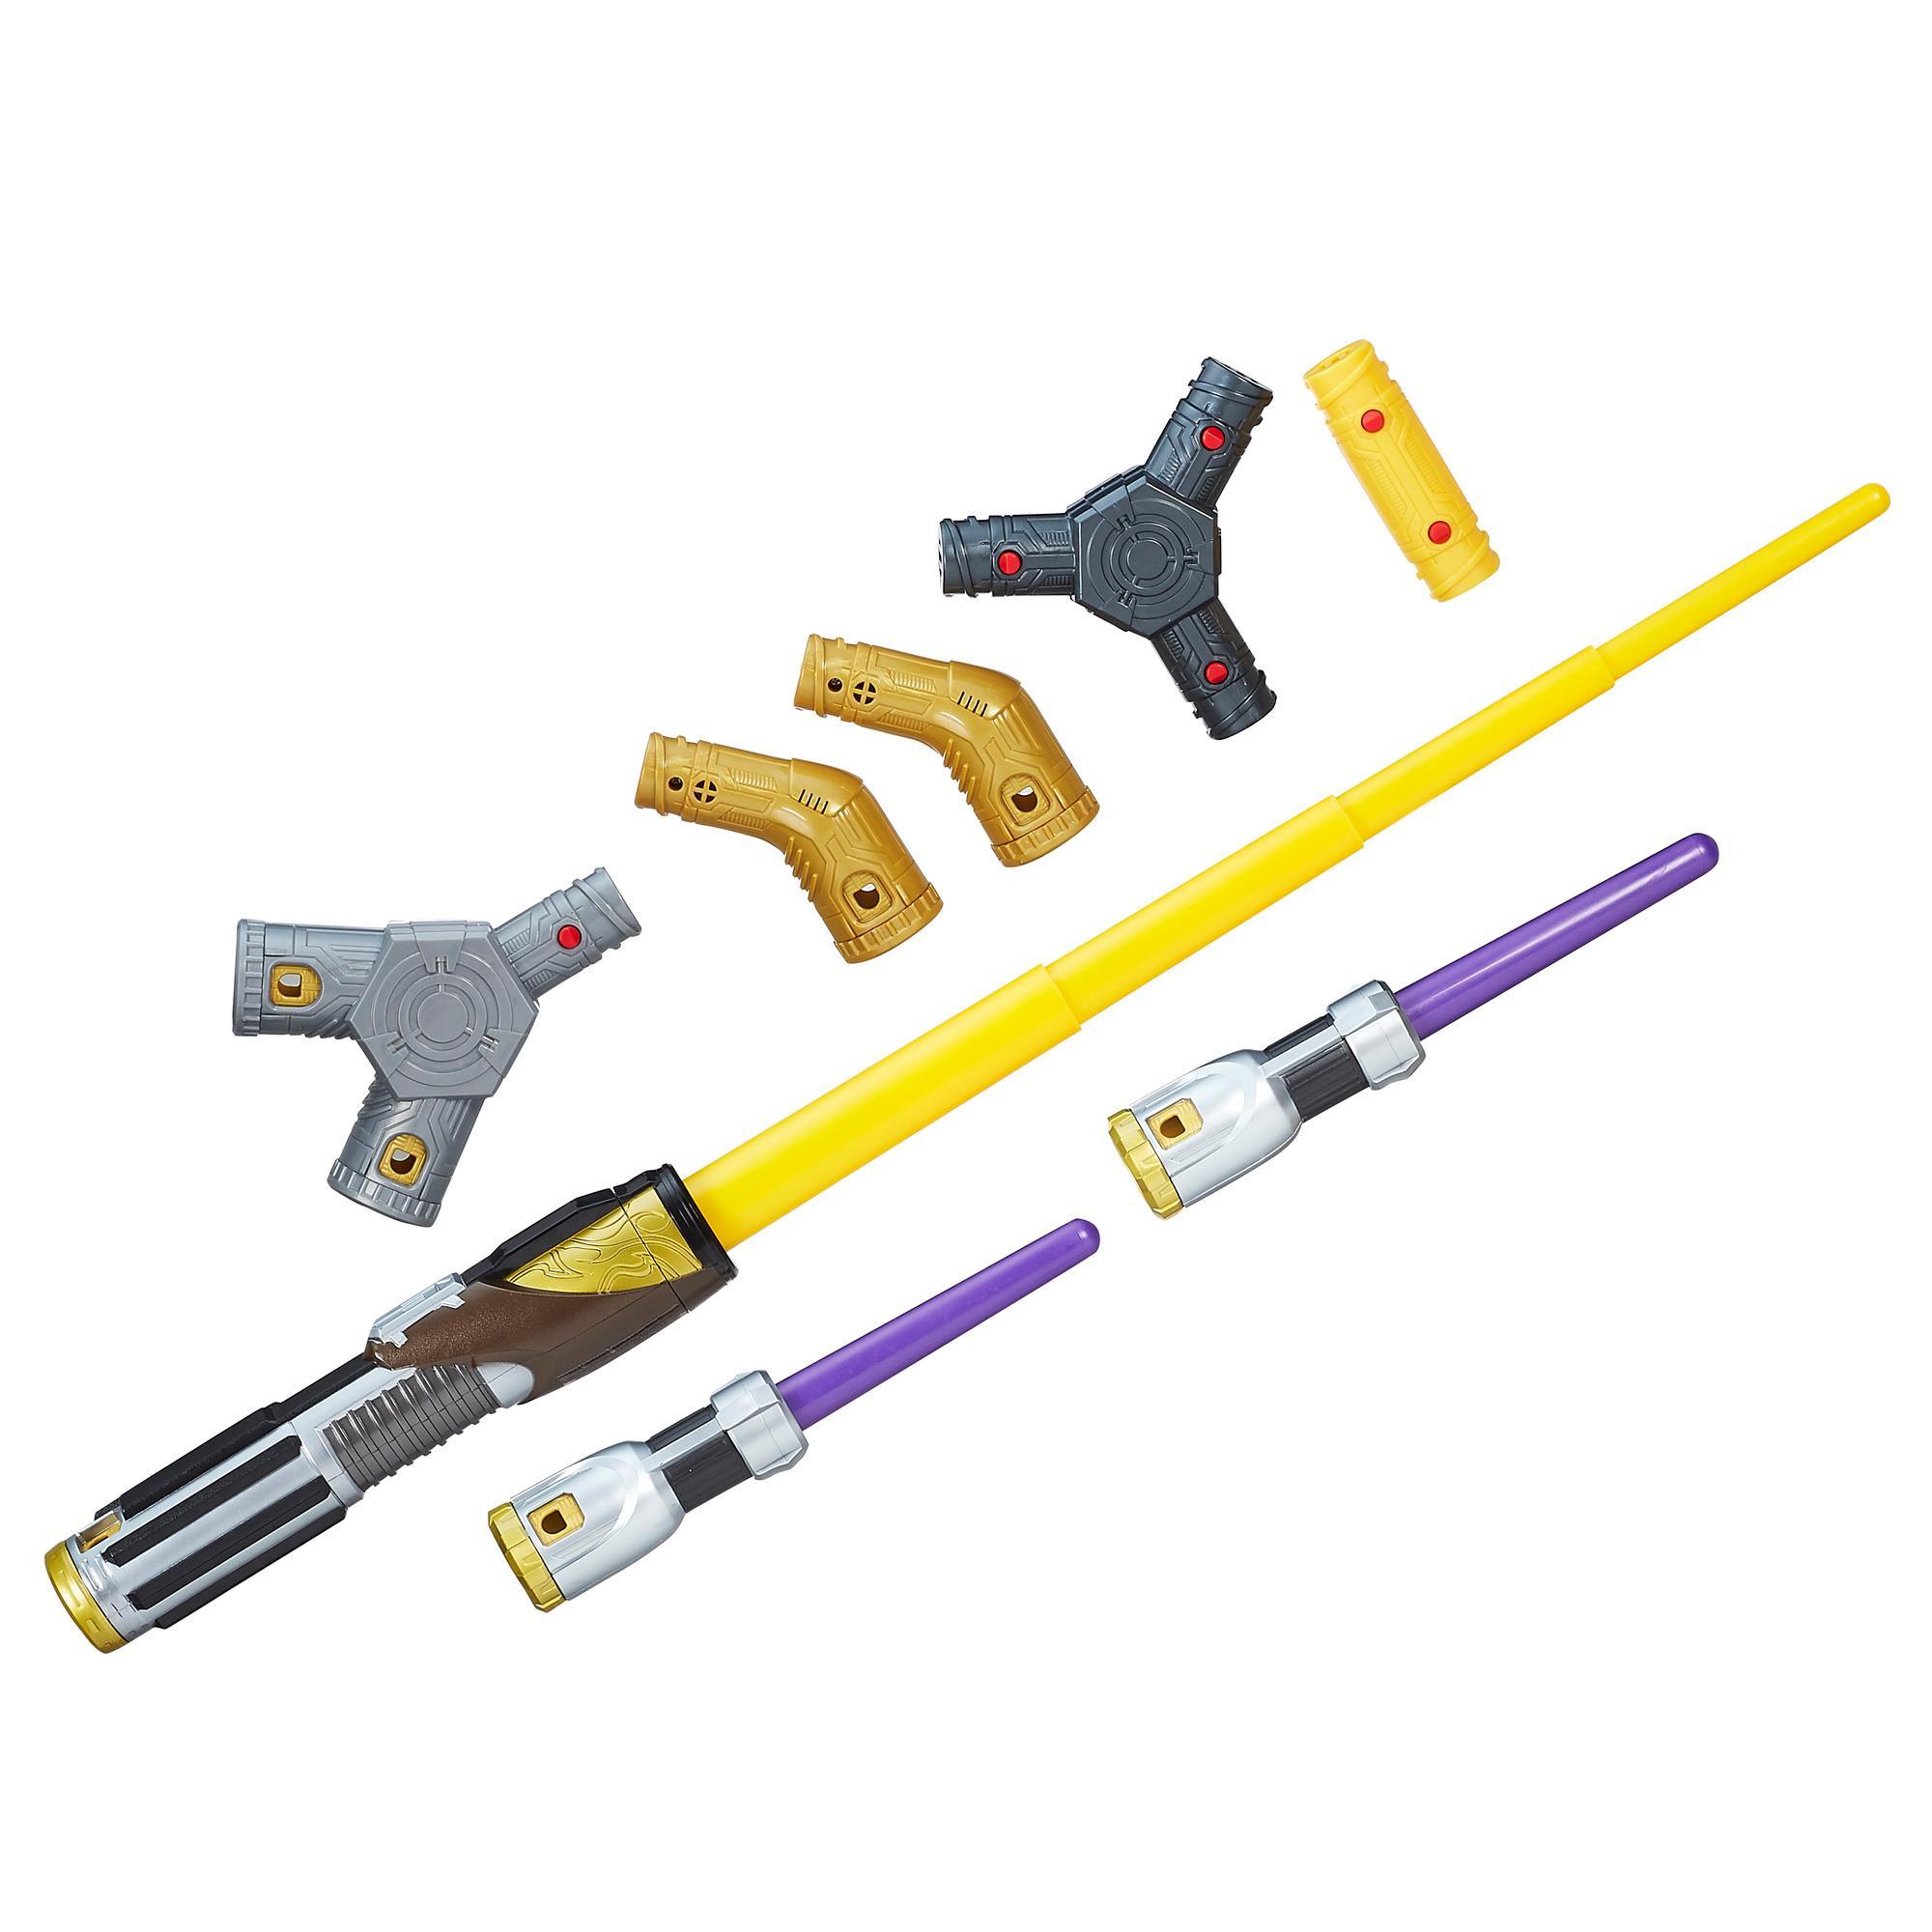 Star Wars: Os Últimos Jedi Bladebuilders - Sabre de luz Cavaleiro Jedi